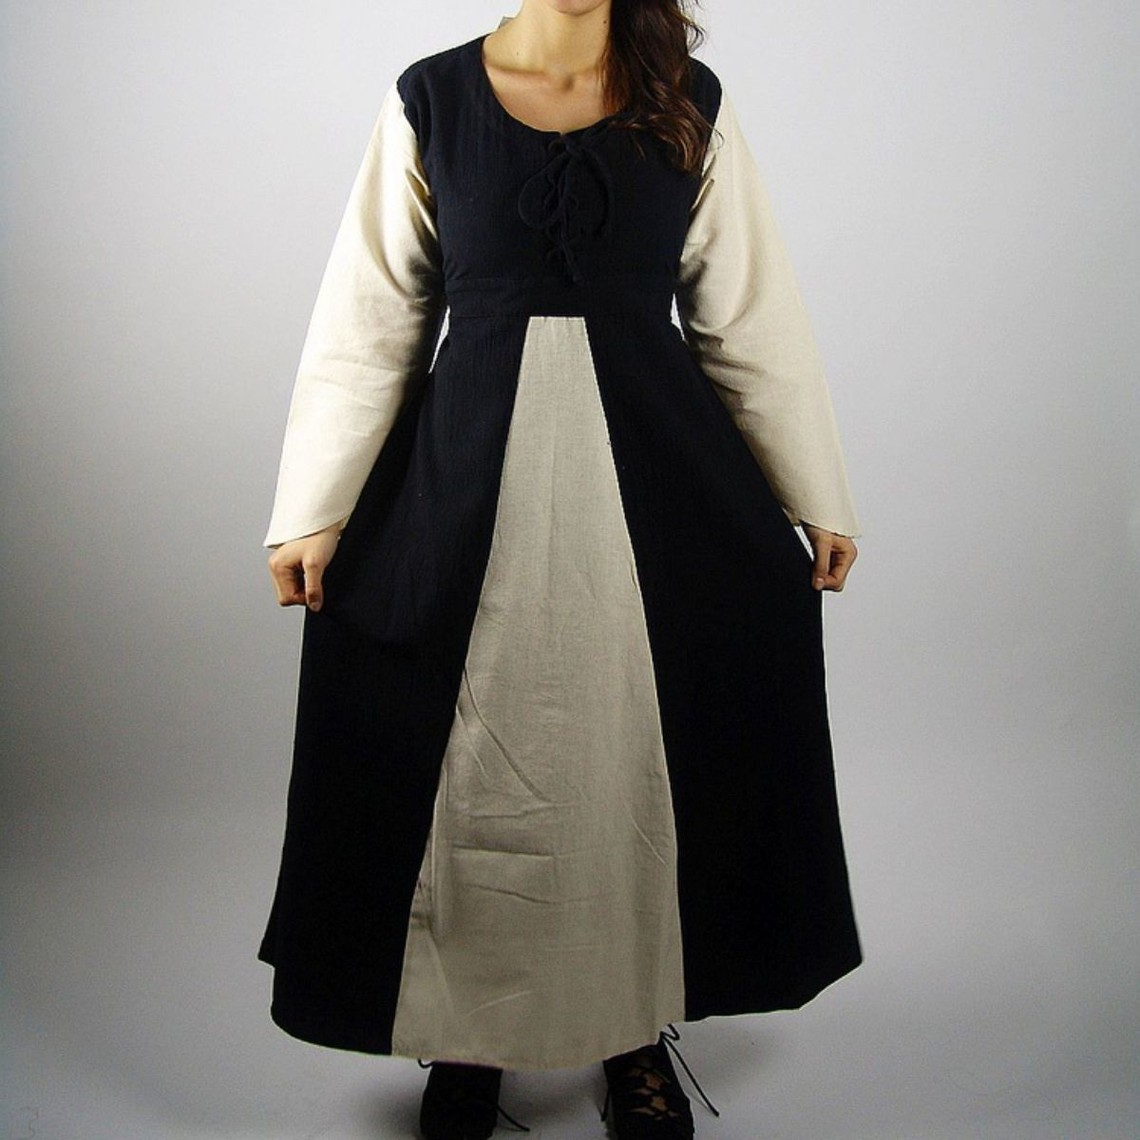 Leonardo Carbone Vestido Marigold, negro-crema